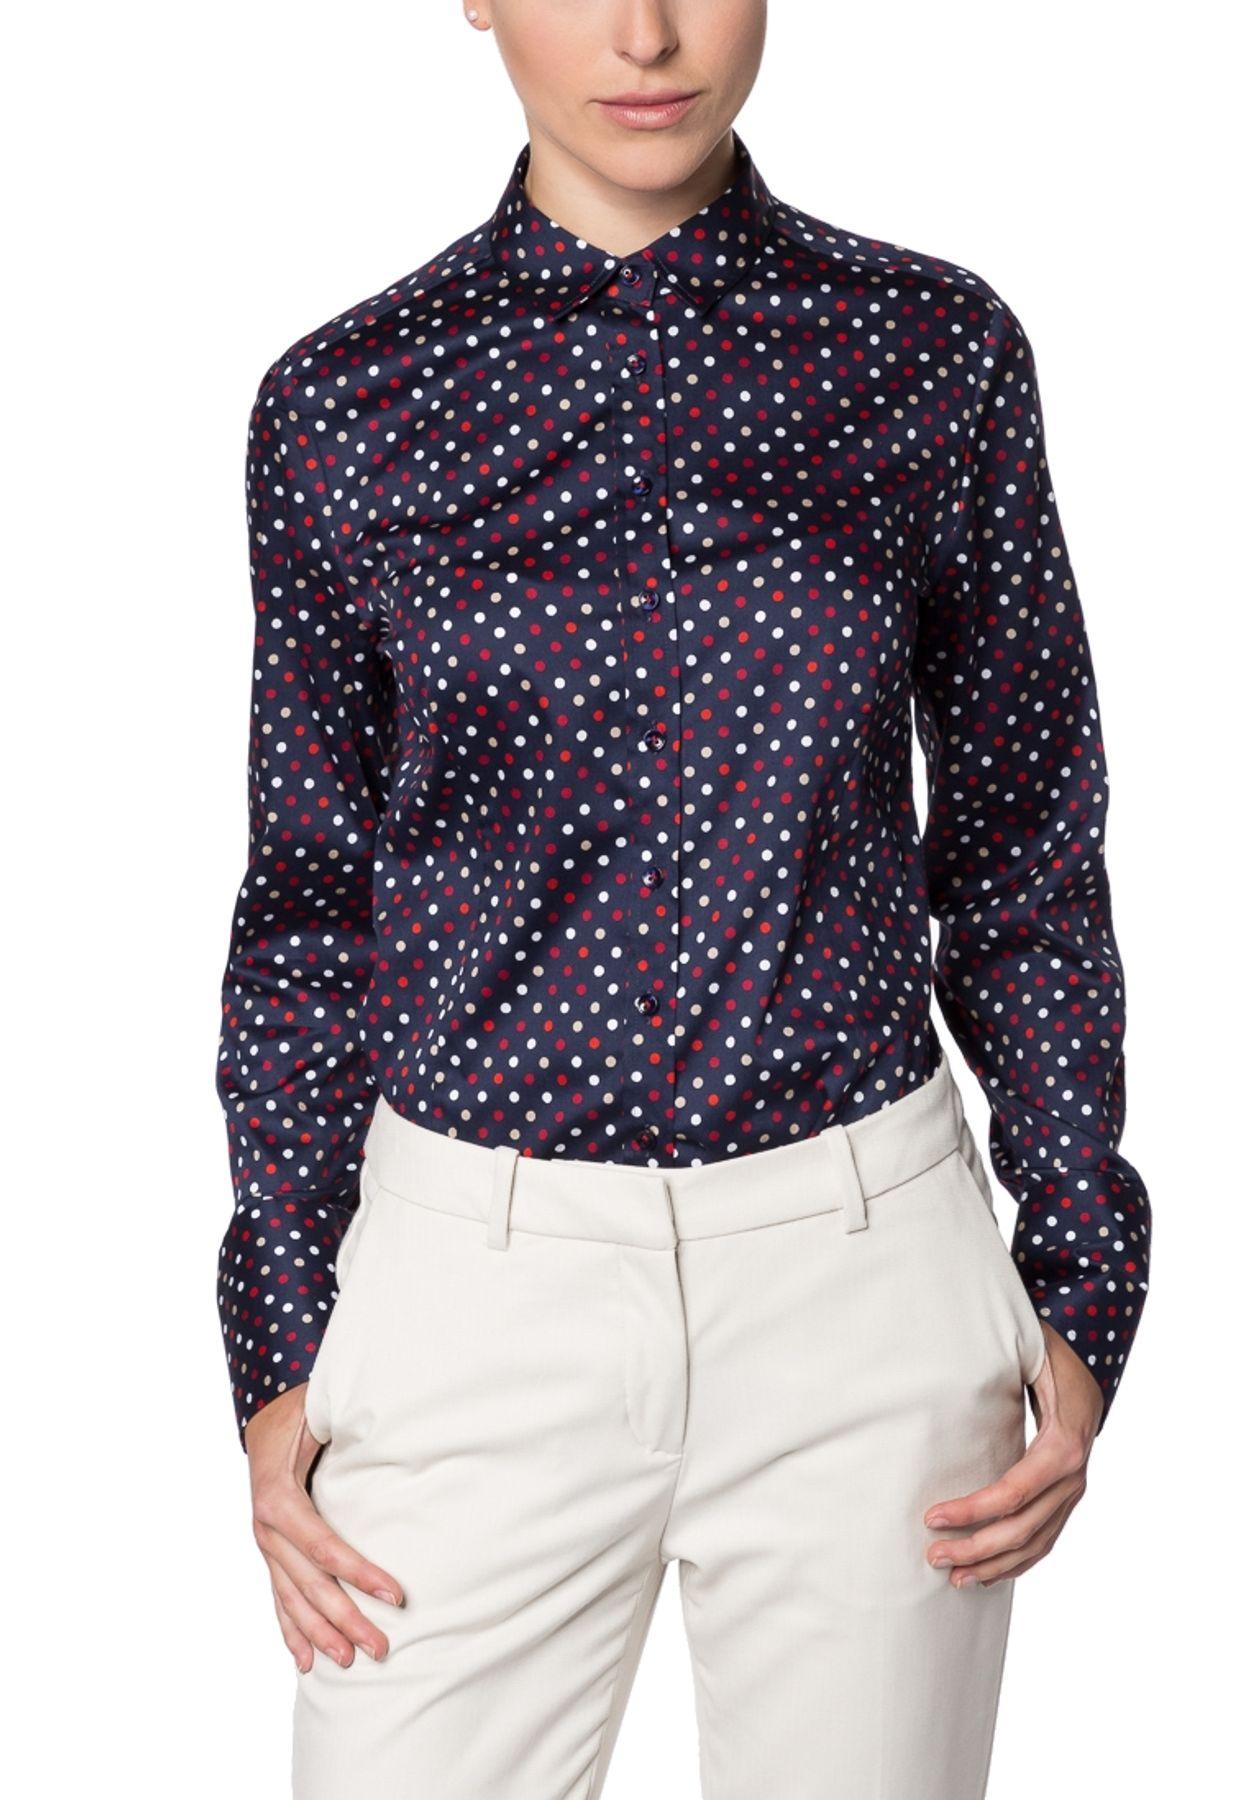 Eterna - Comfort Fit - Damen Langarm Bluse in Marineblau/Rot bedruckt (7614 D624) – Bild 1